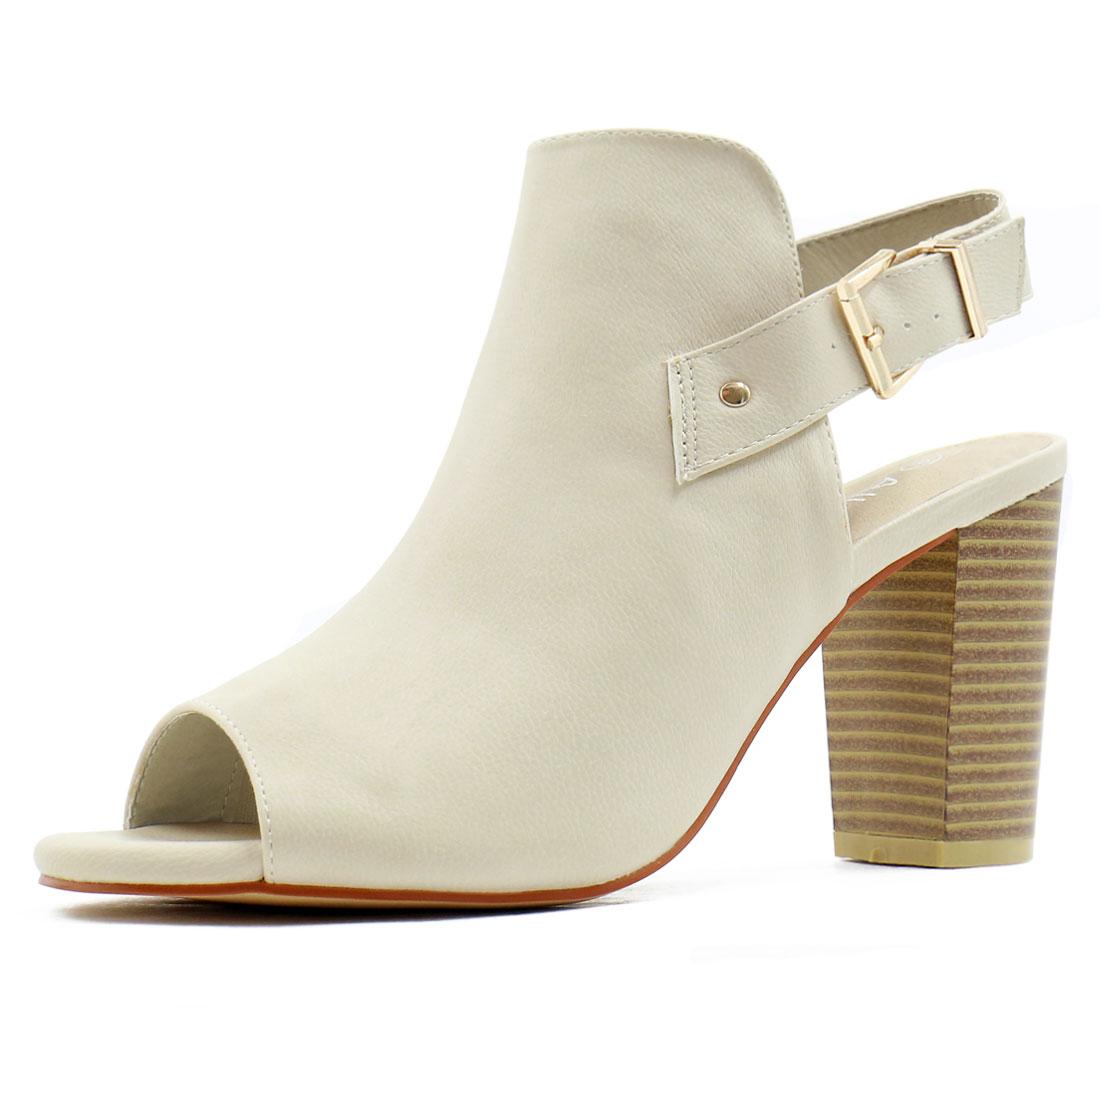 Women Peep Toe Slip On Stacked Heel Slingback Sandals Ivory US 6.5